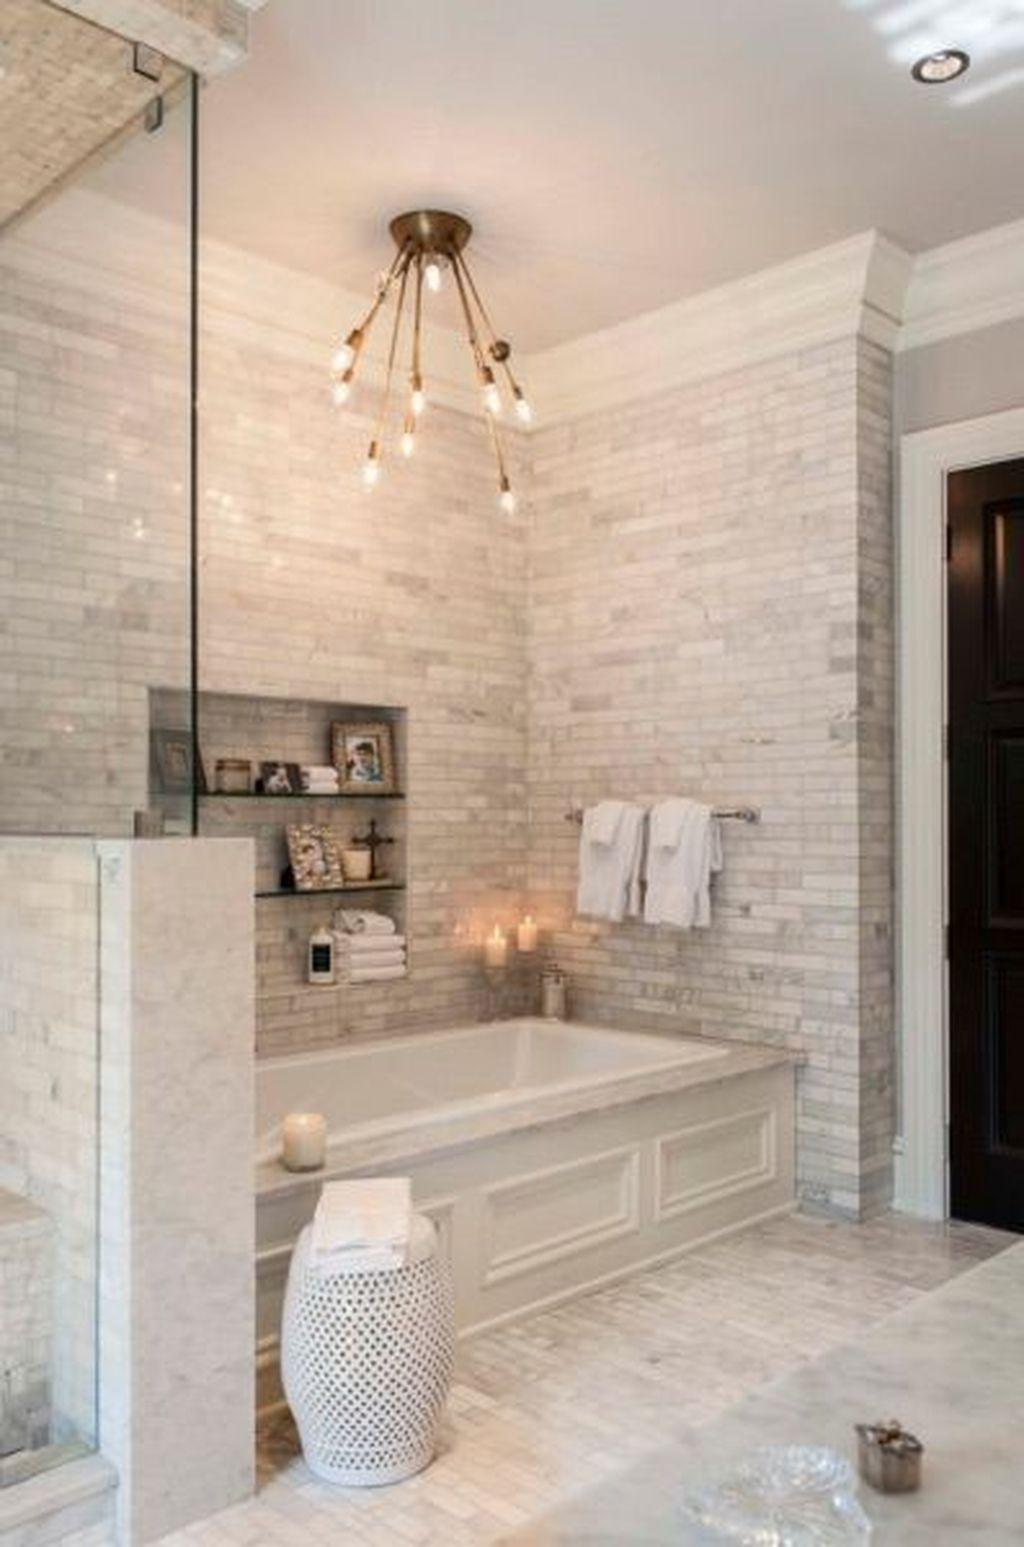 Cool 36 Fancy Spa Like Bathroom Ideas Home More At Https Homishome Com 2018 11 23 36 Fancy Spa Like Bathroom Ideas Hom Home Bathrooms Remodel House Bathroom